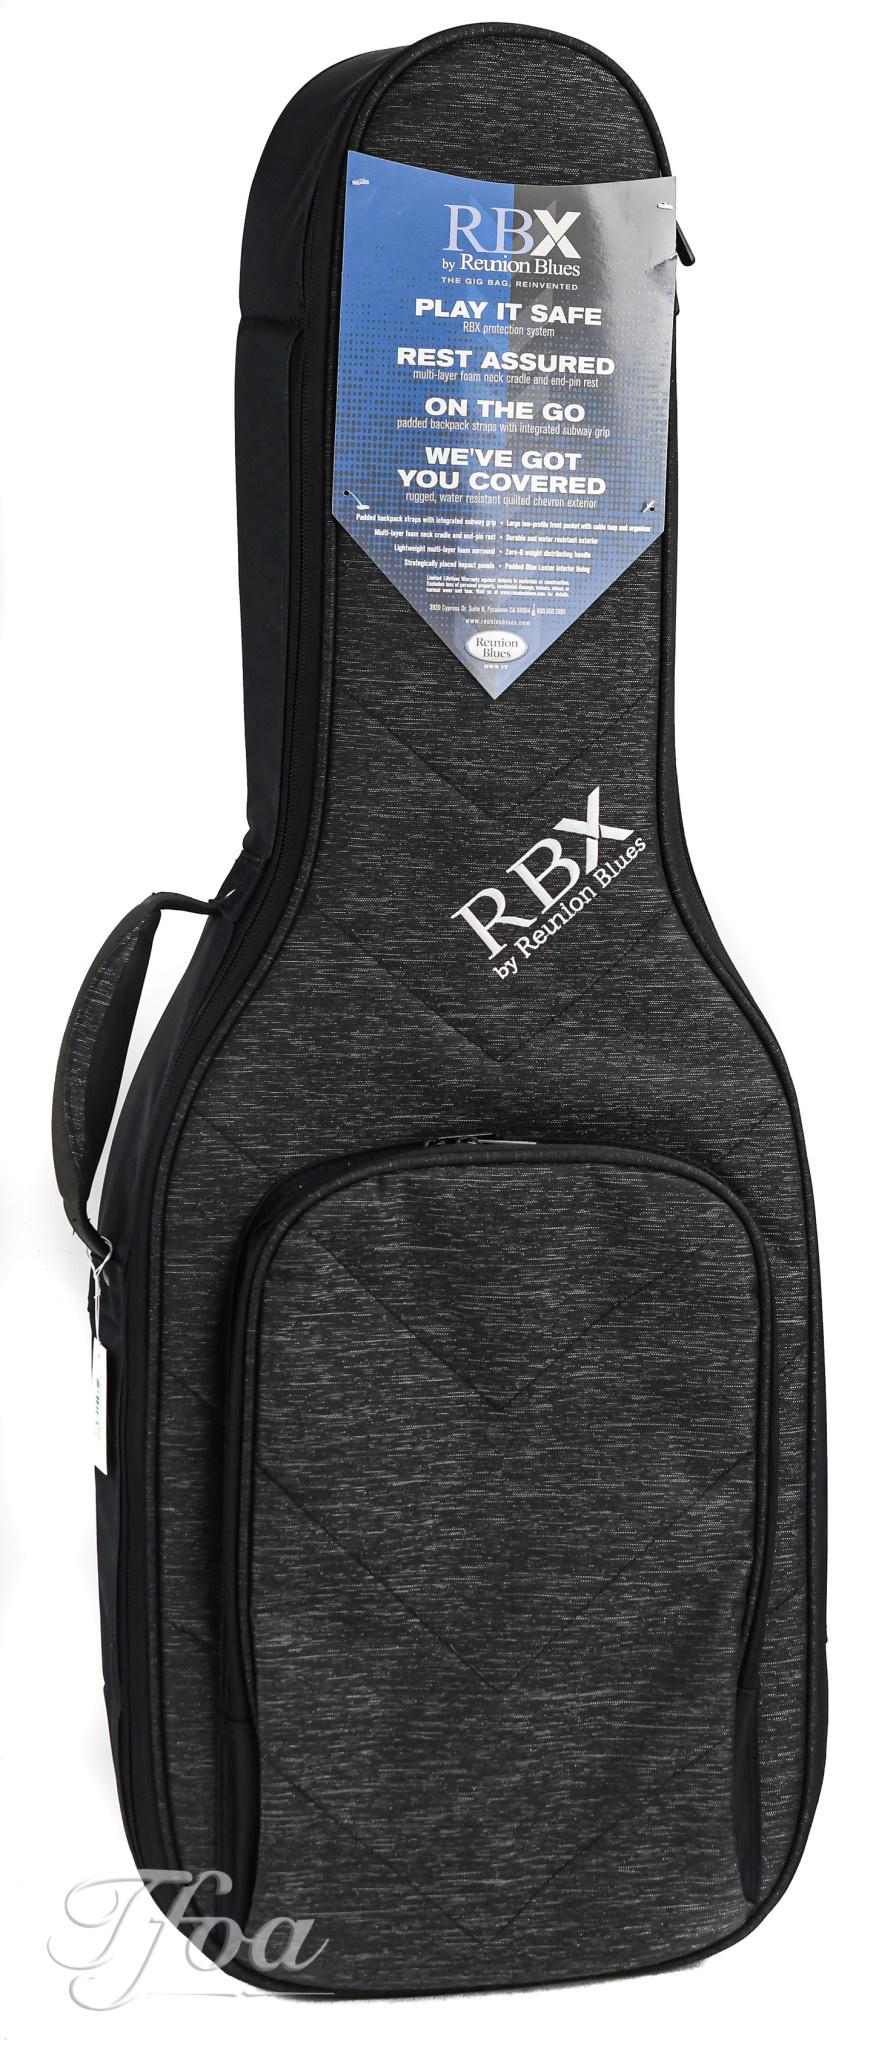 Reunion Blues RBX Oxford Electric Guitar Gig Bag